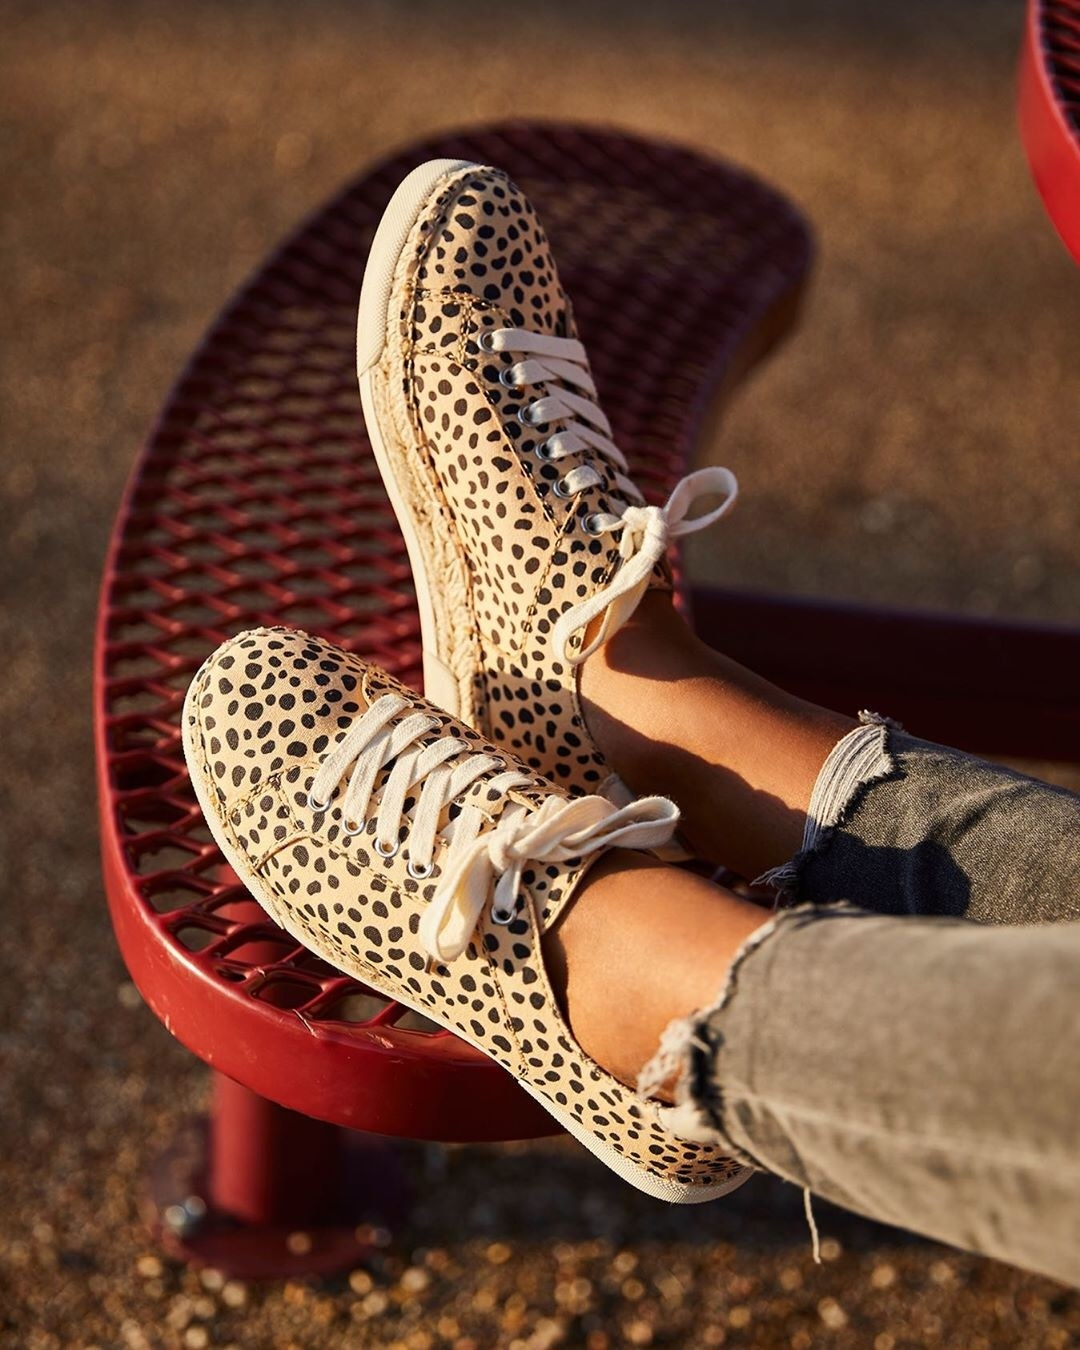 The cheetah print sneakers